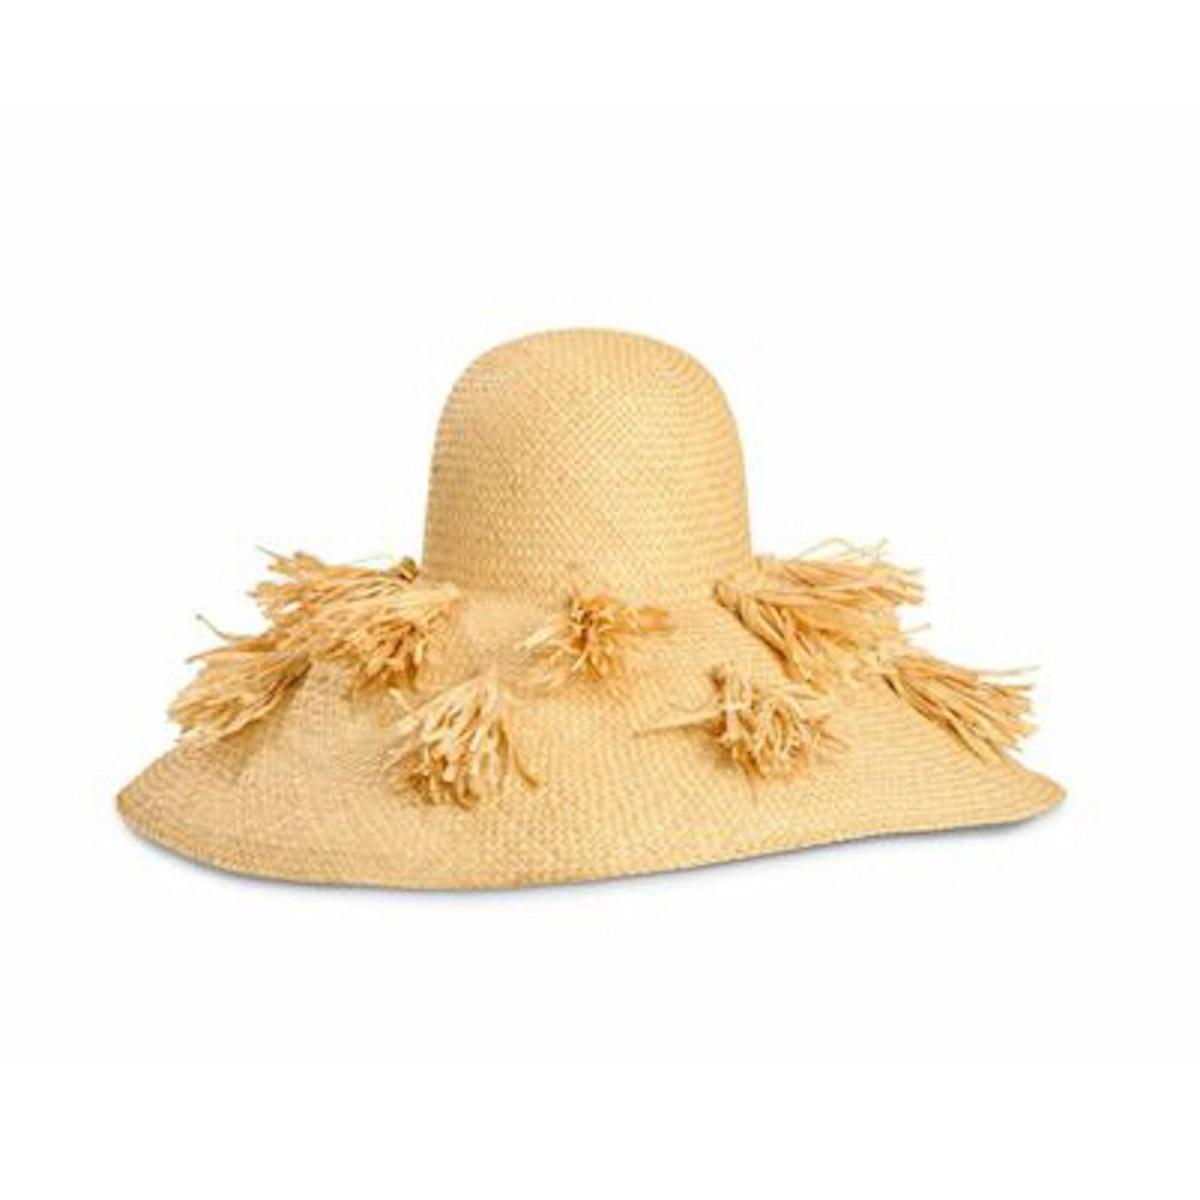 PRESTON AND OLIVIA hat